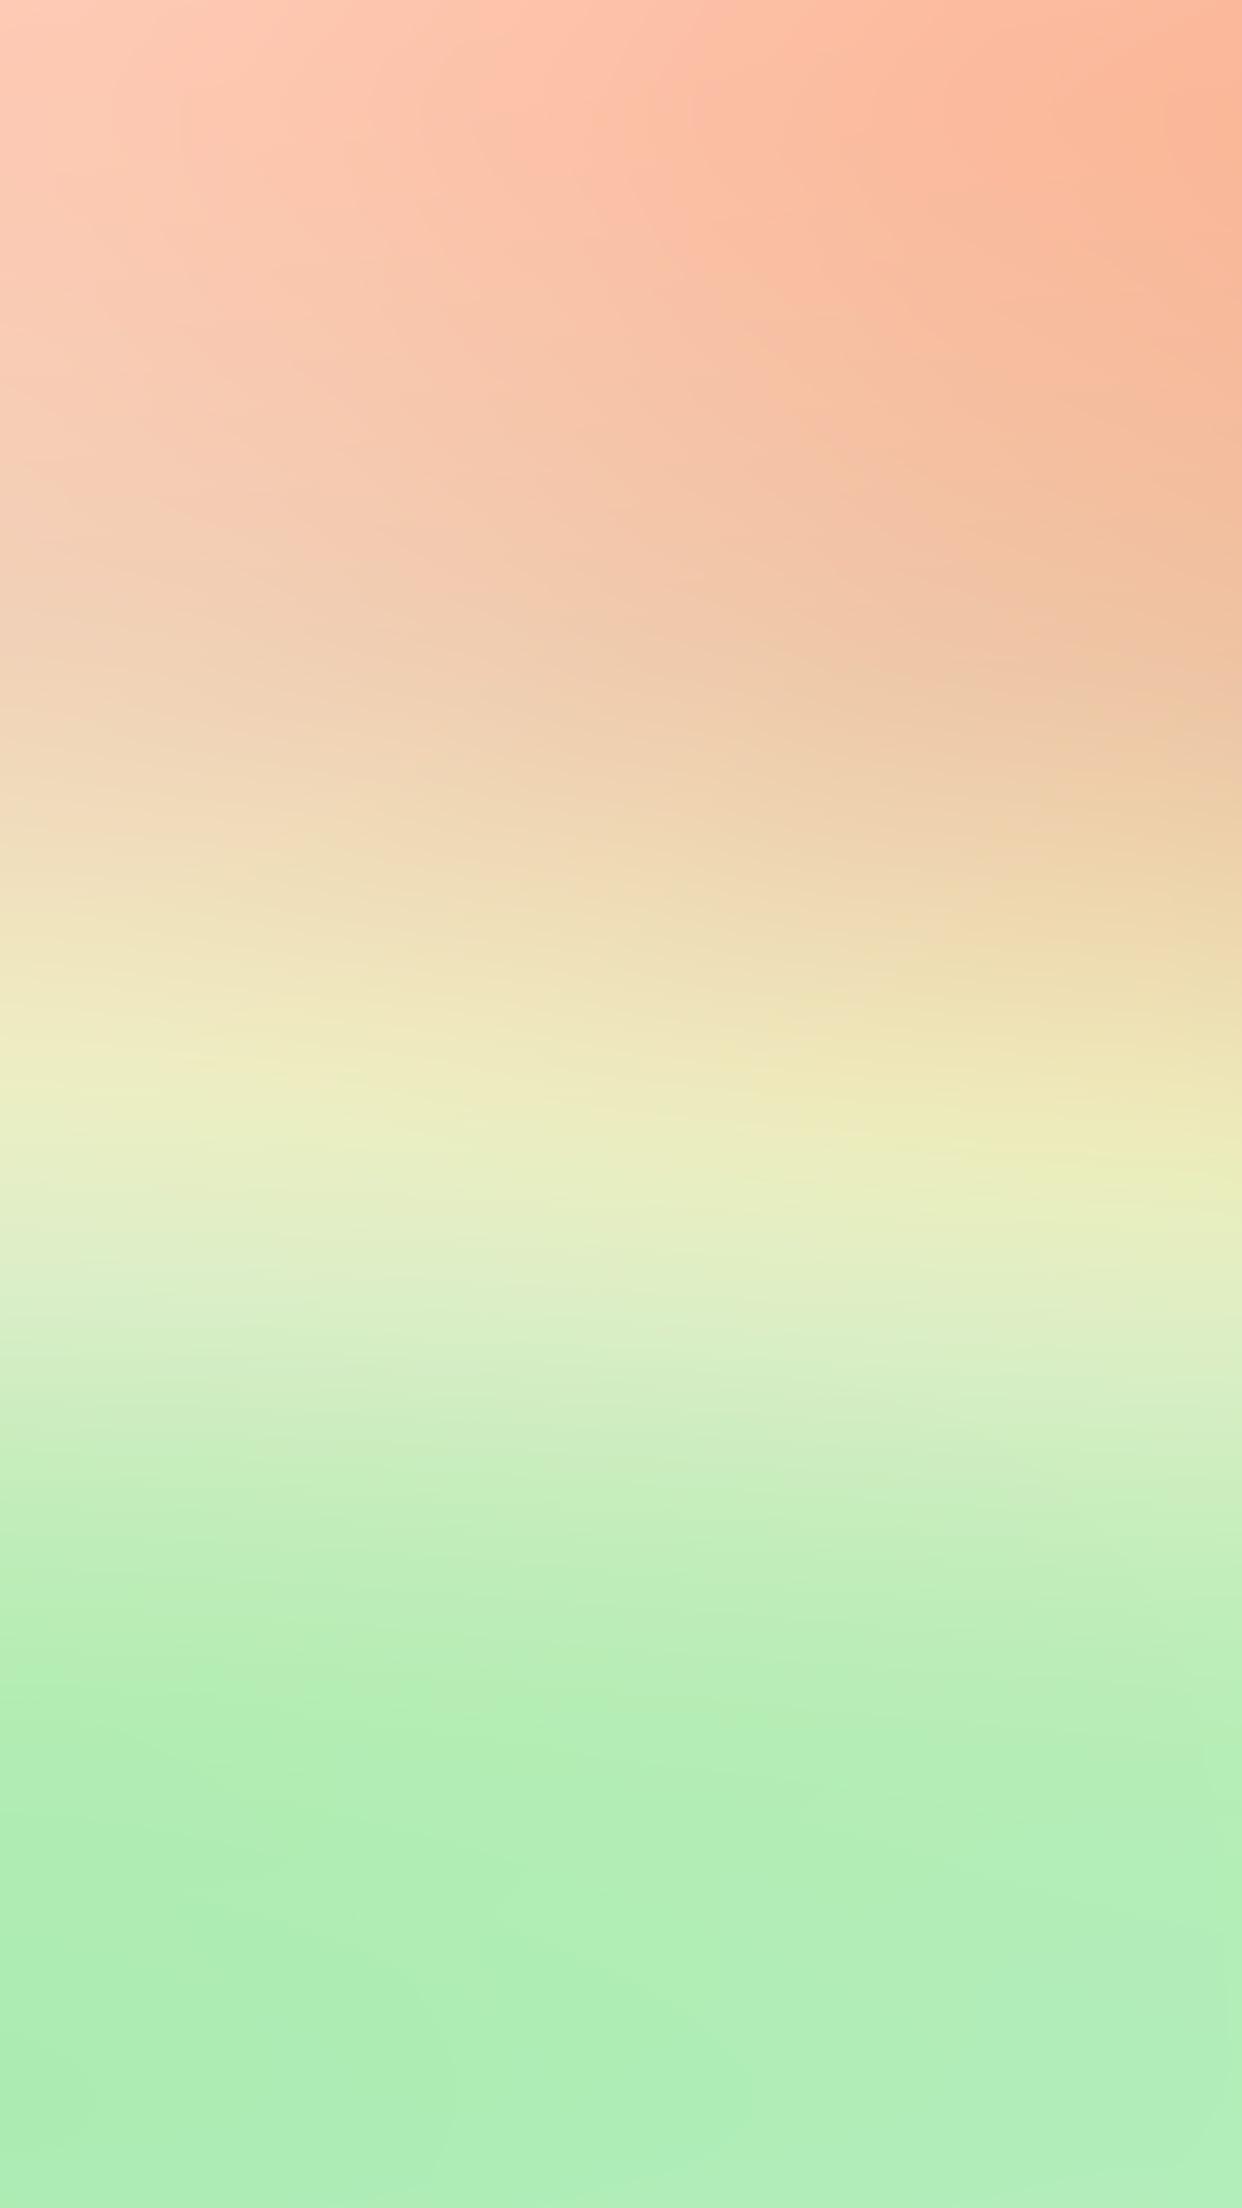 Wallpaper Iphone Pastel Sl92 Red Green Pastel Blur Gradation Wallpaper